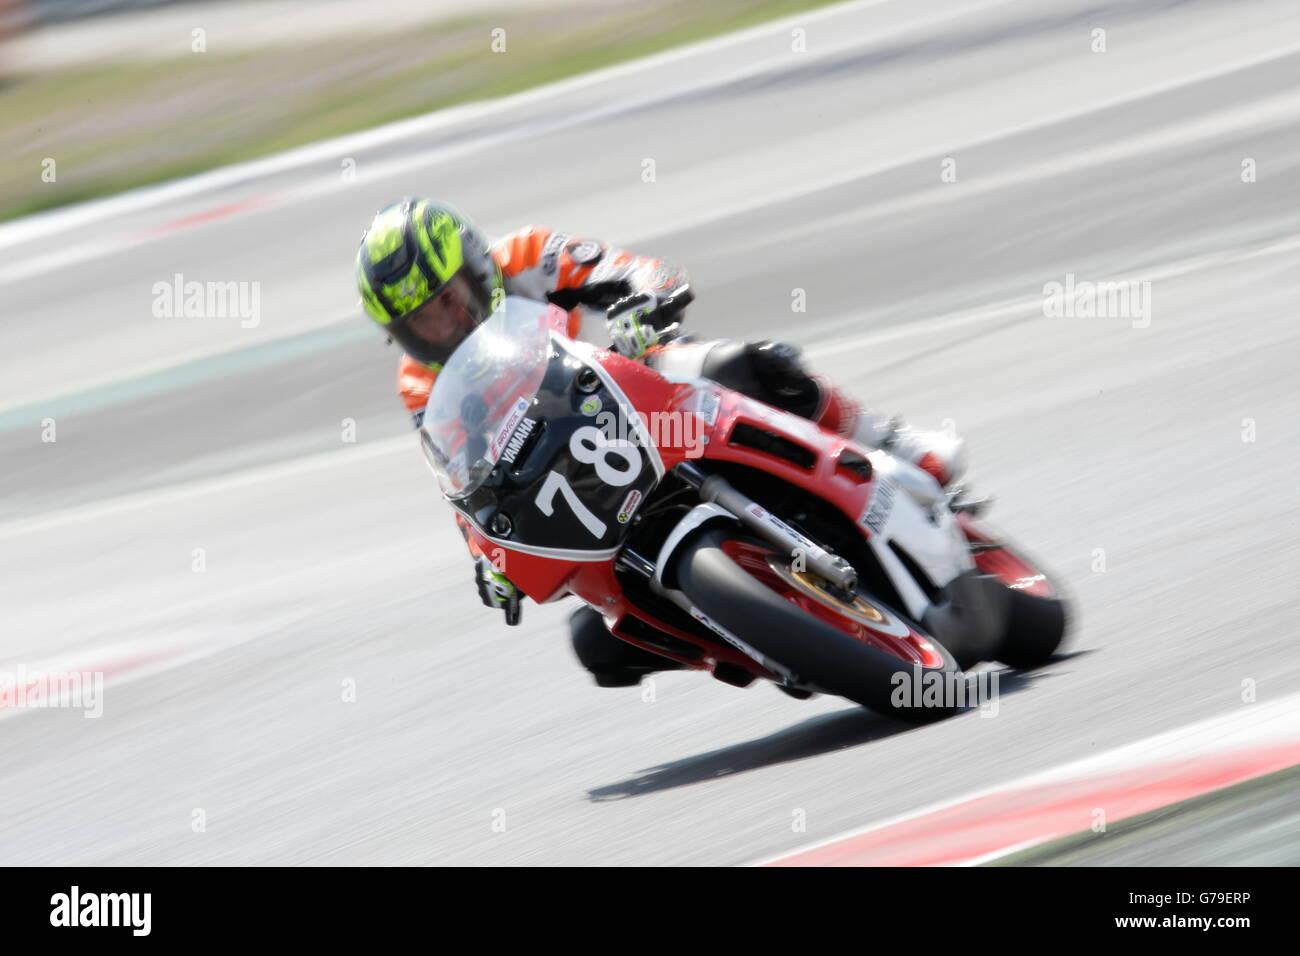 Barcelona, Spain. 26th June, 2016. FERNANDEZ APARICIO, ANDRES member of the Penya Motorista Barcelona team, in action - Stock Image